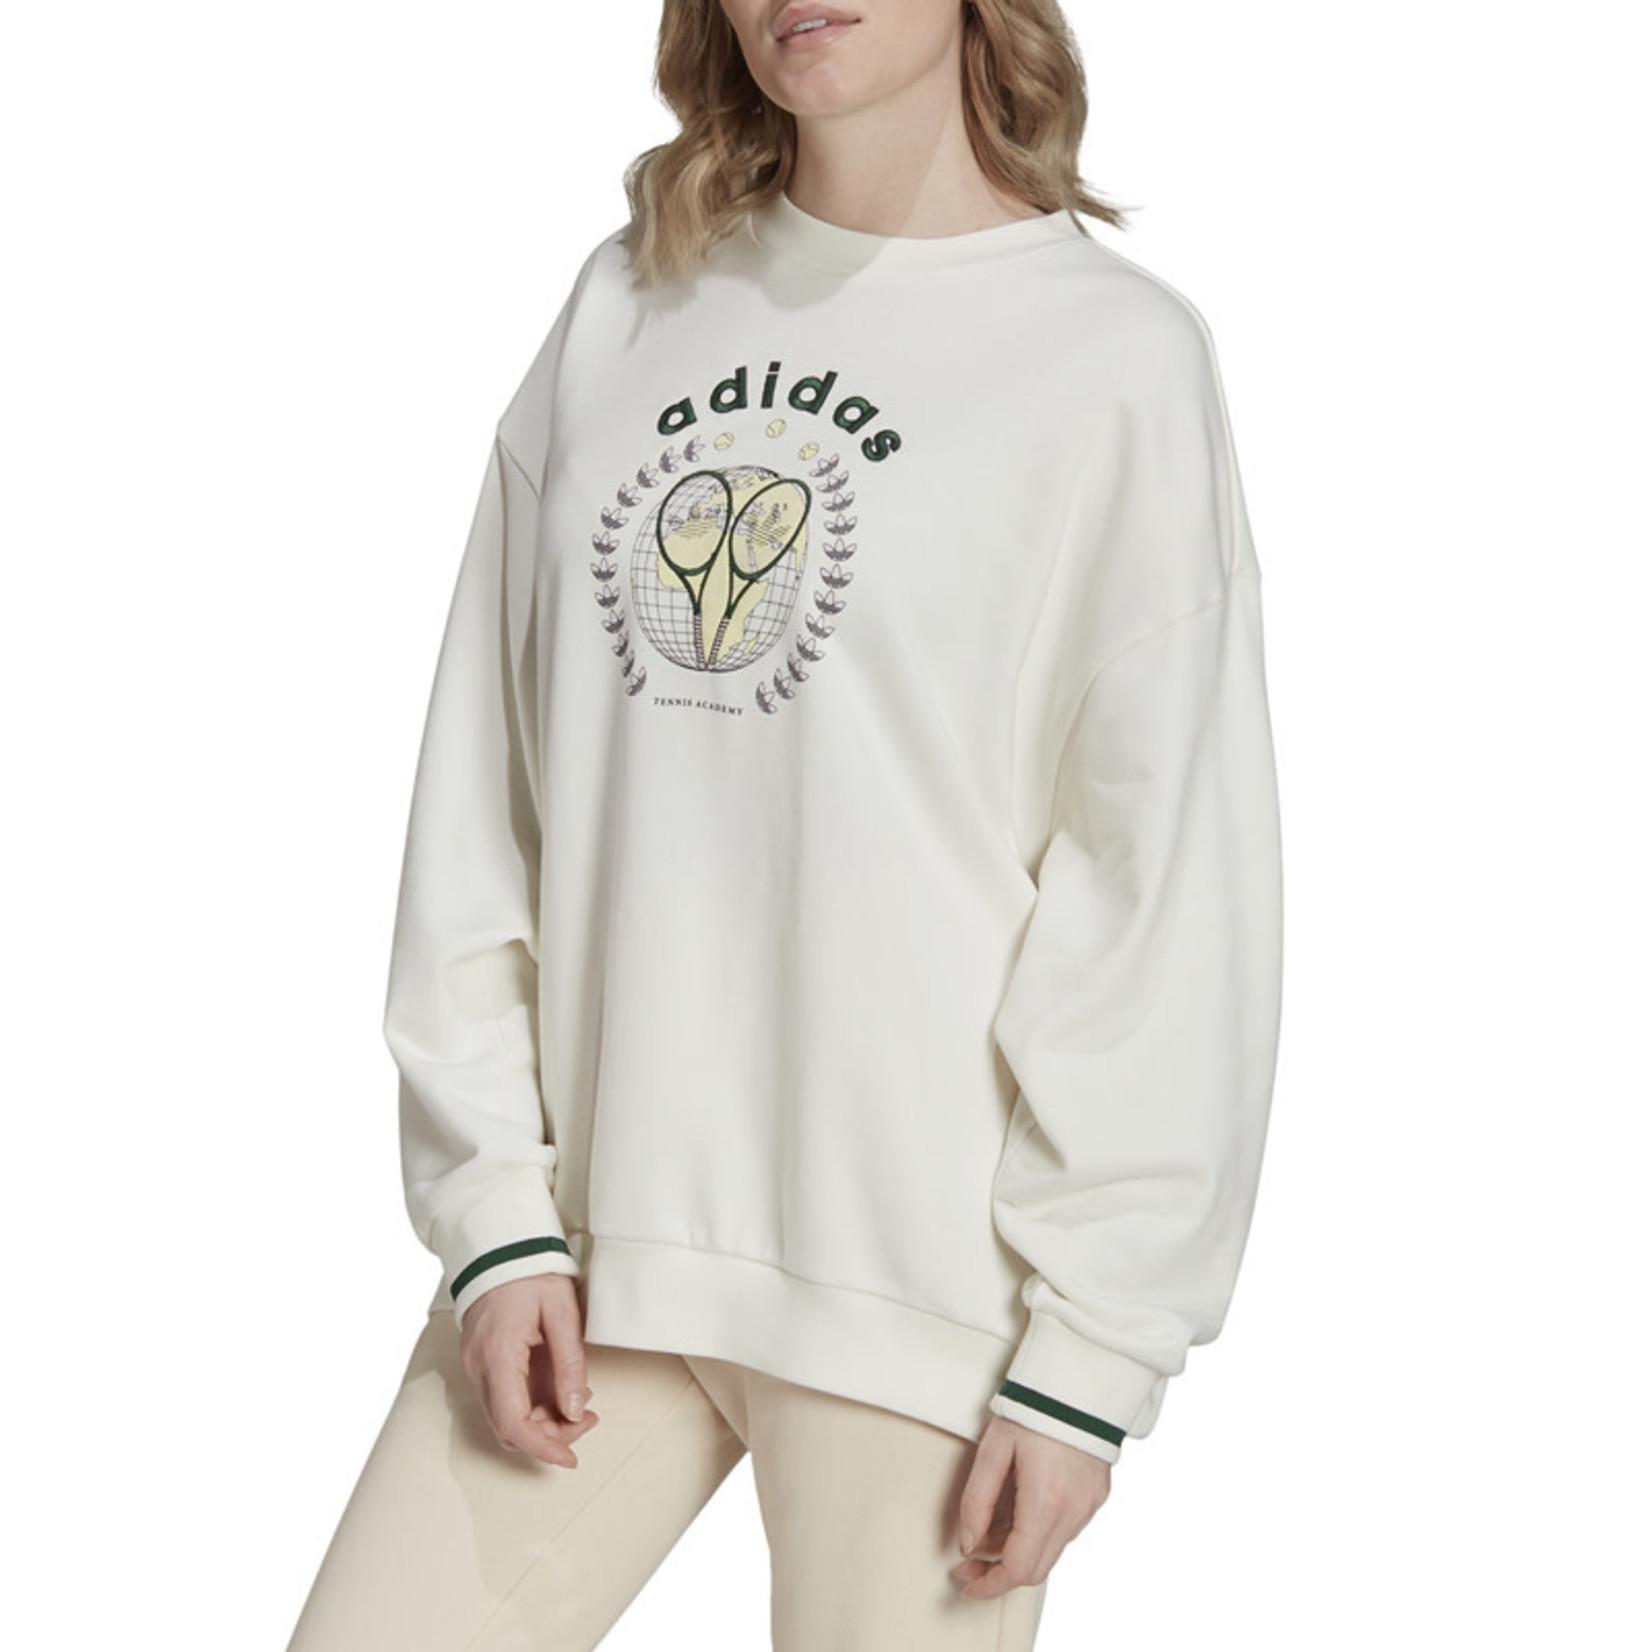 Adidas Adidas : Graphic Crewneck